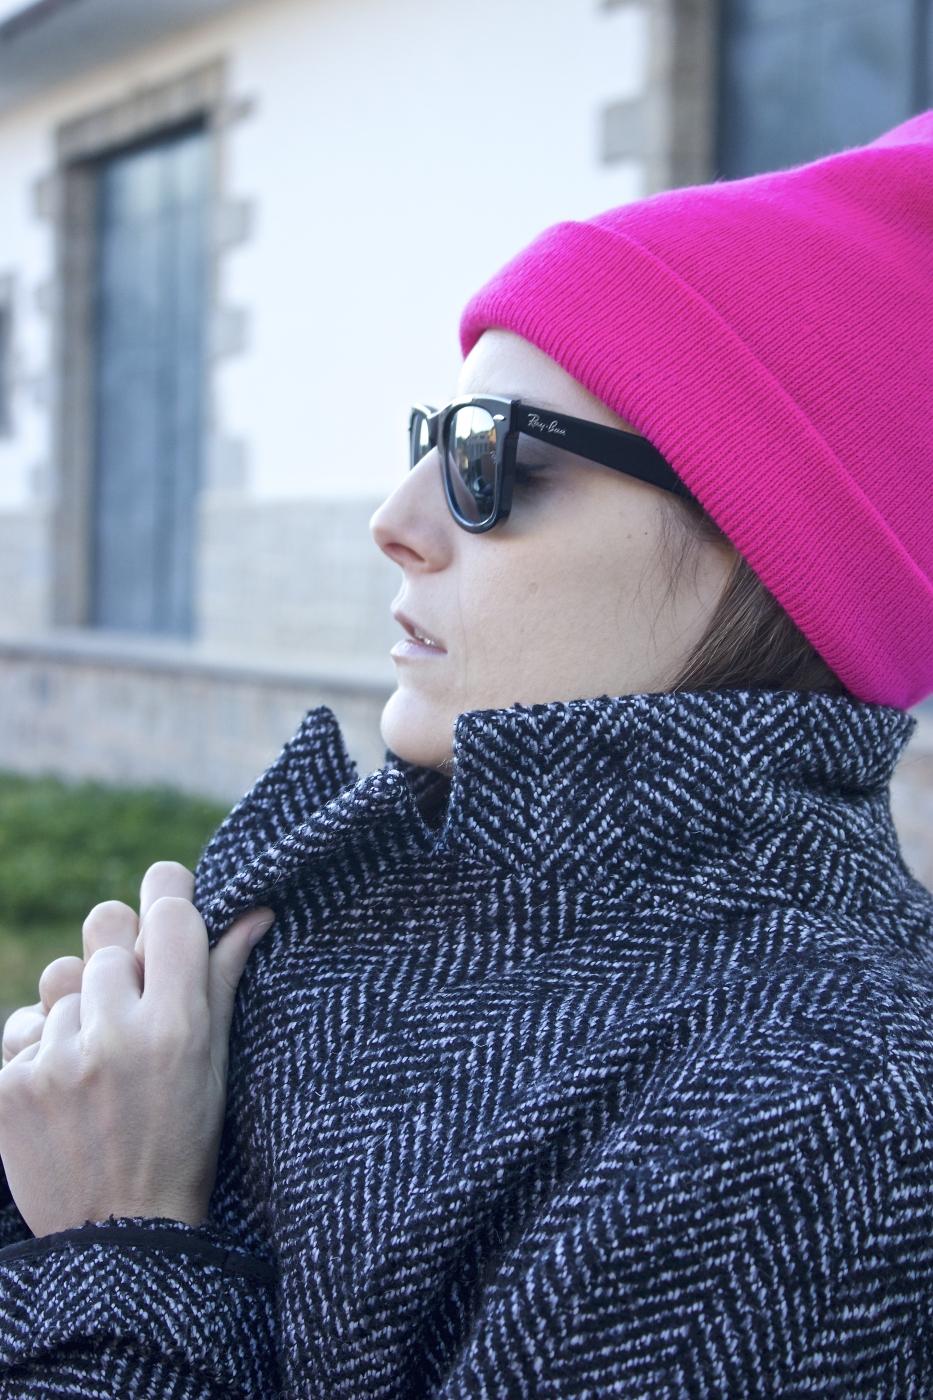 lara-vazquez-madlula-pop-of-pink-beanie-winter